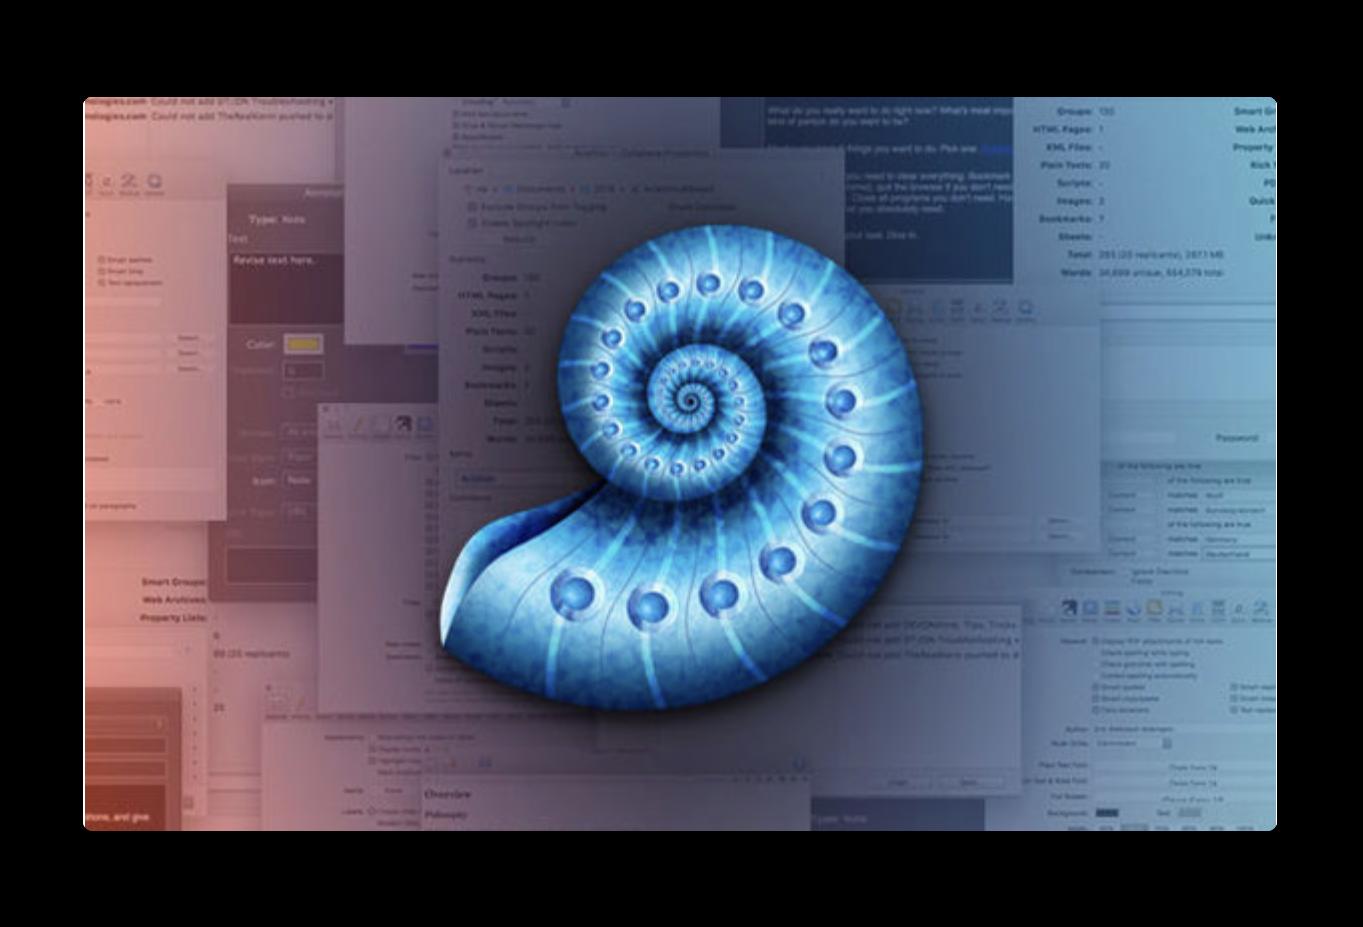 【iOS】iCloudでのバックグラウンドでの同期が追加された「DEVONthink To Go 2.6」がリリース